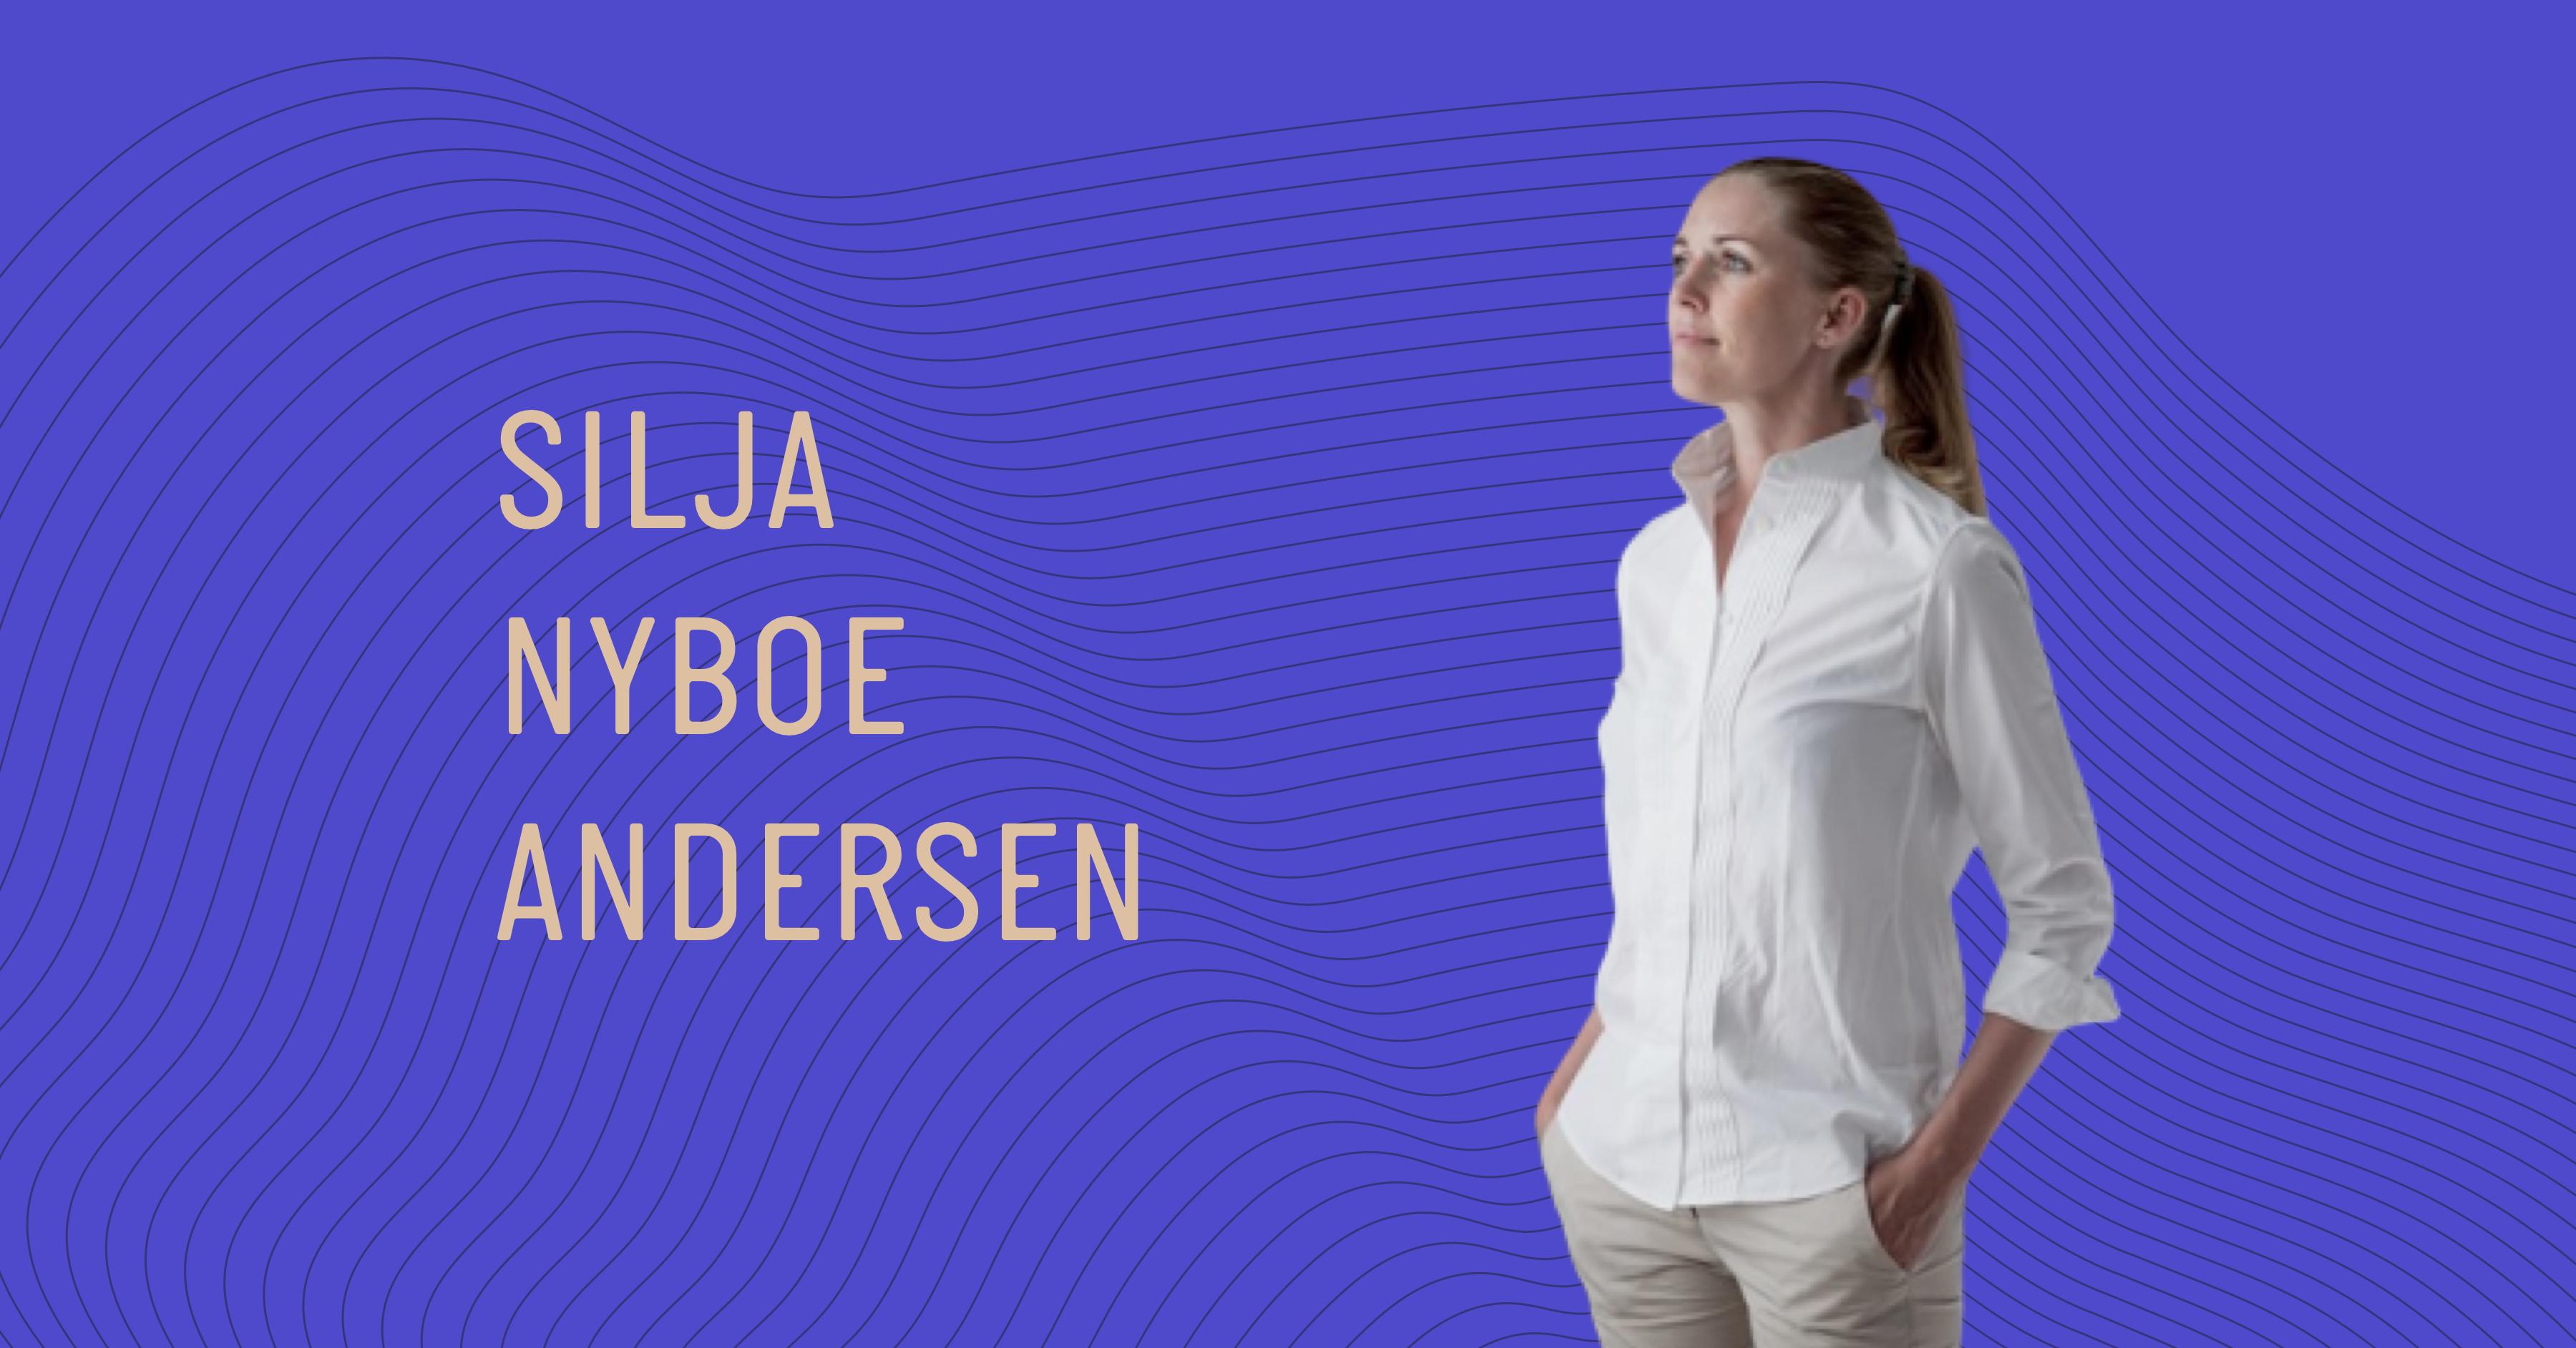 Silja Nyboe Andersen